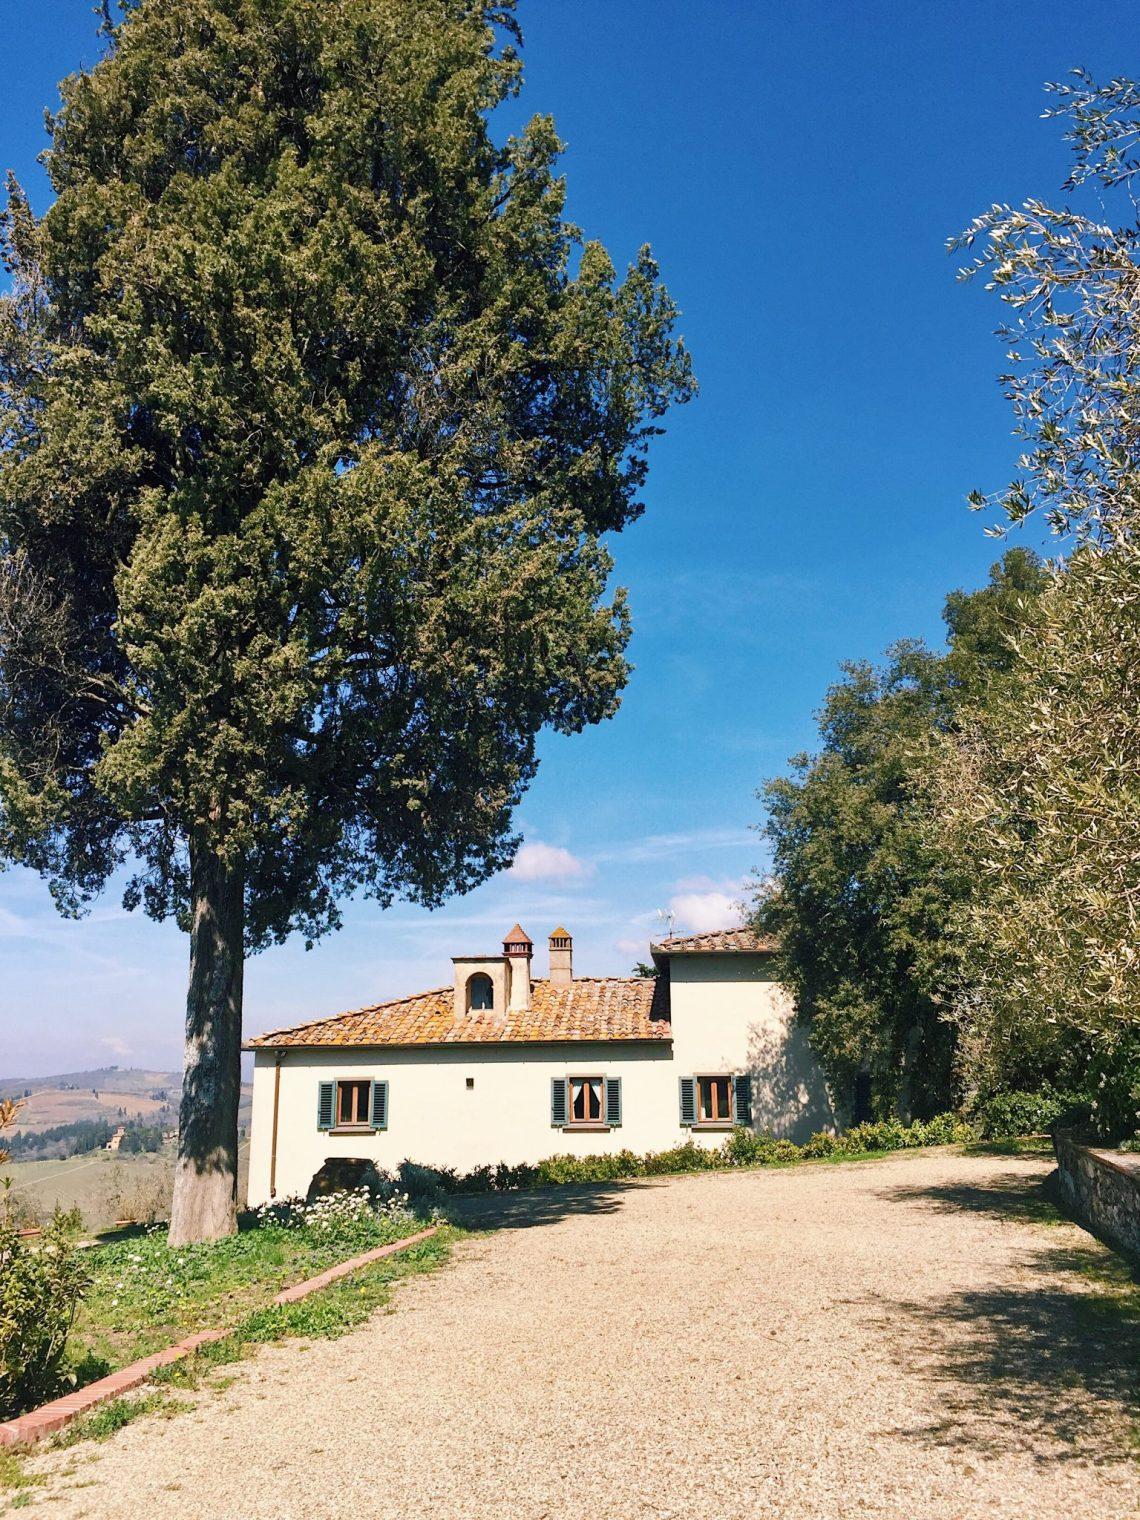 Fontodi winery in Chianti, Italy